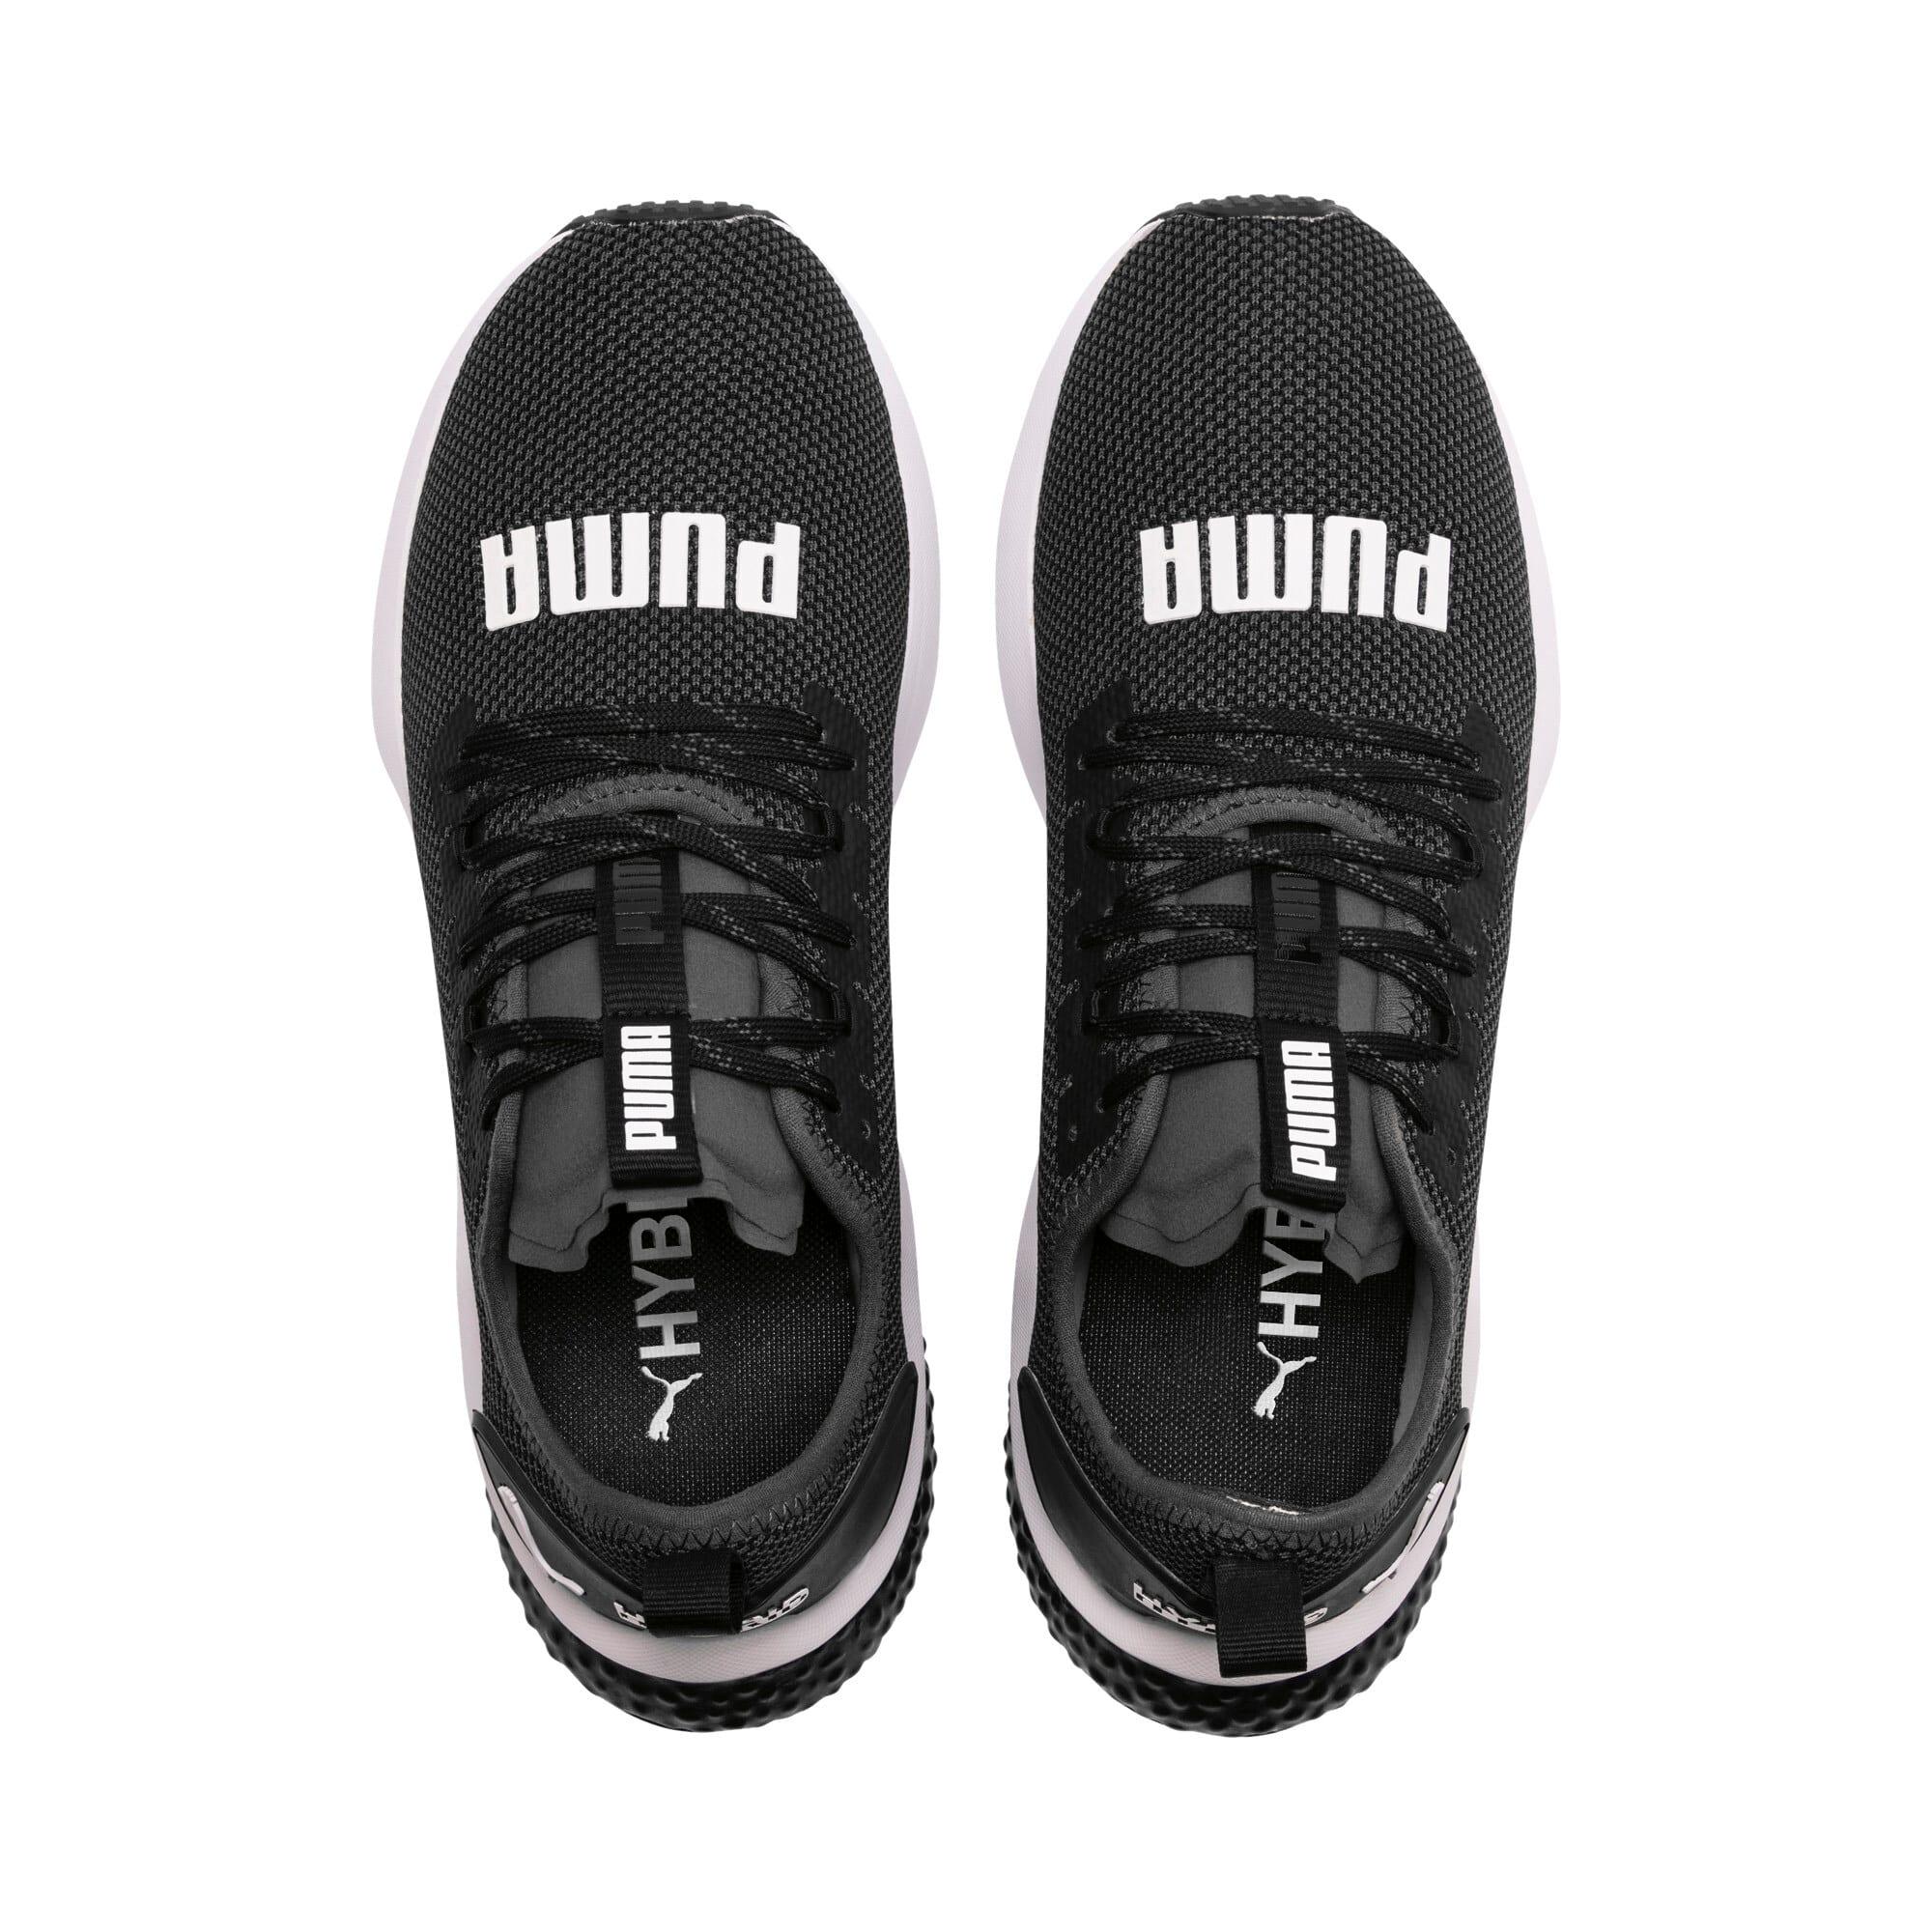 Thumbnail 7 of HYBRID NX Men's Running Shoes, Puma Black-Puma White, medium